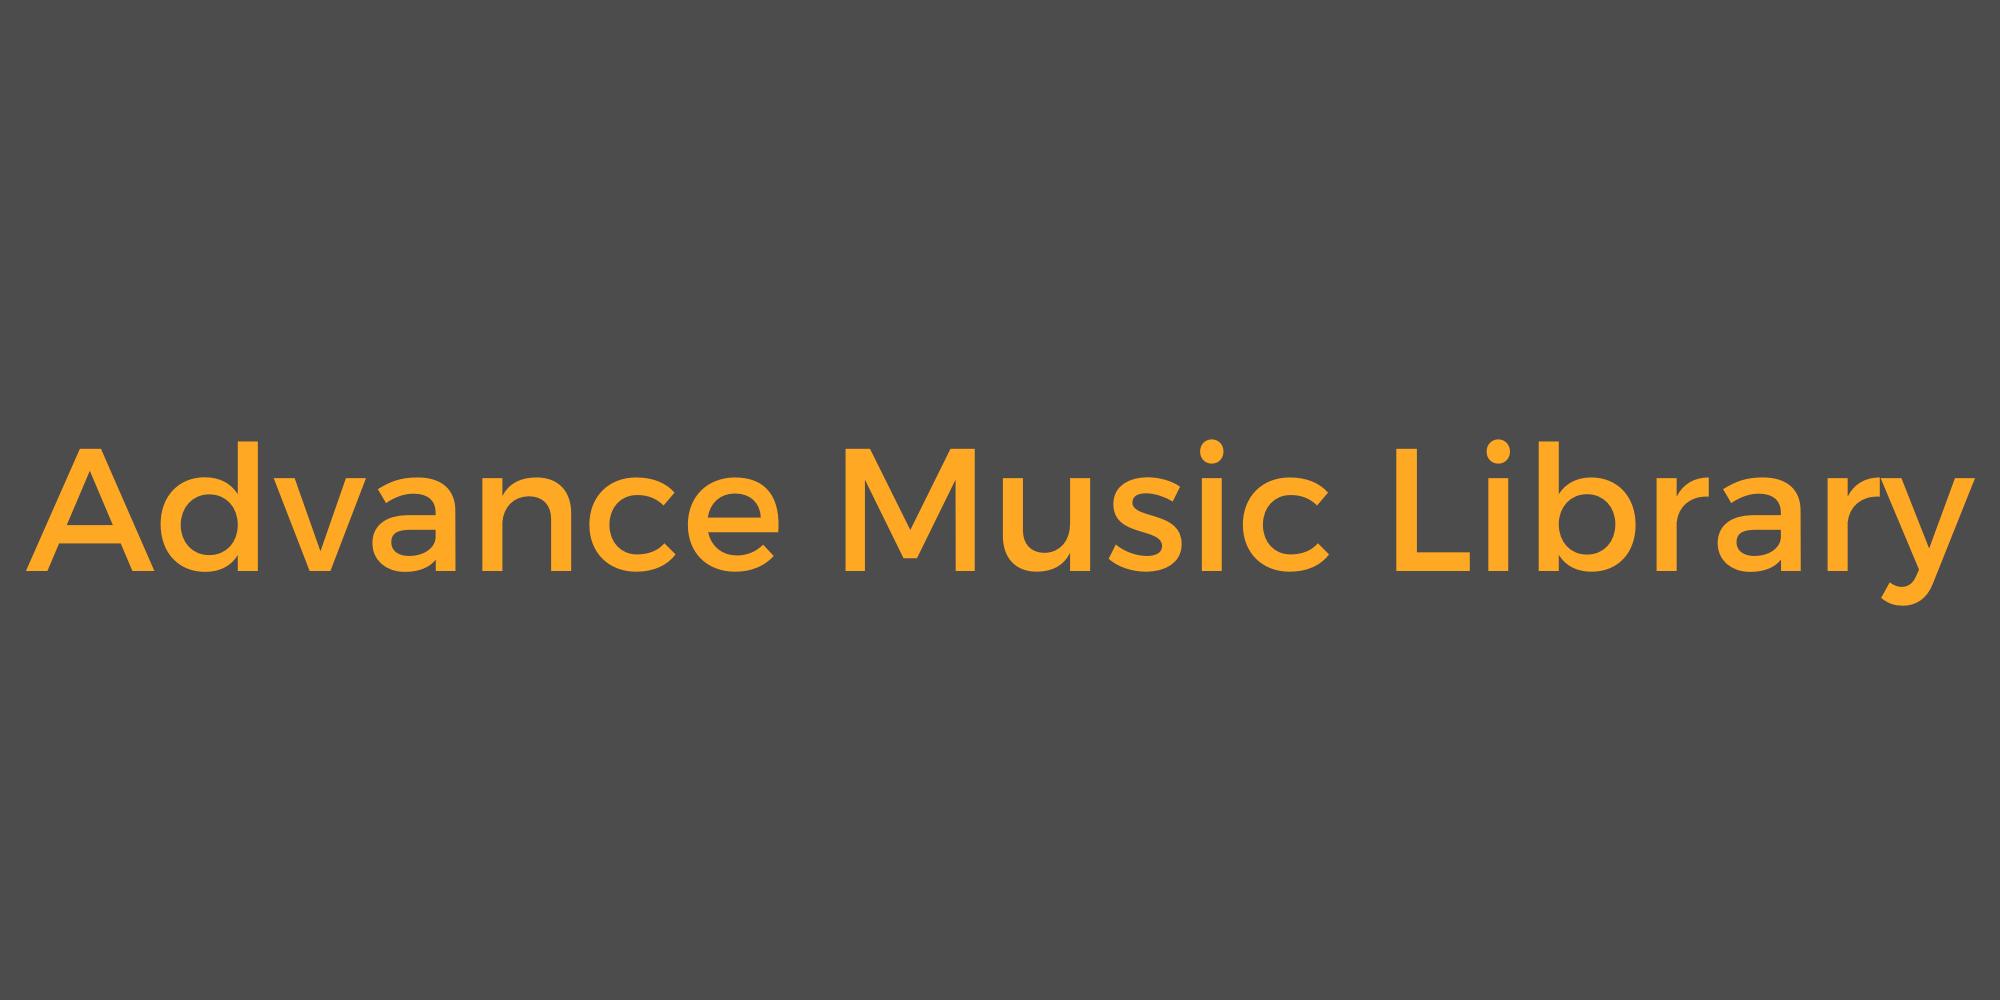 Advance Music Library